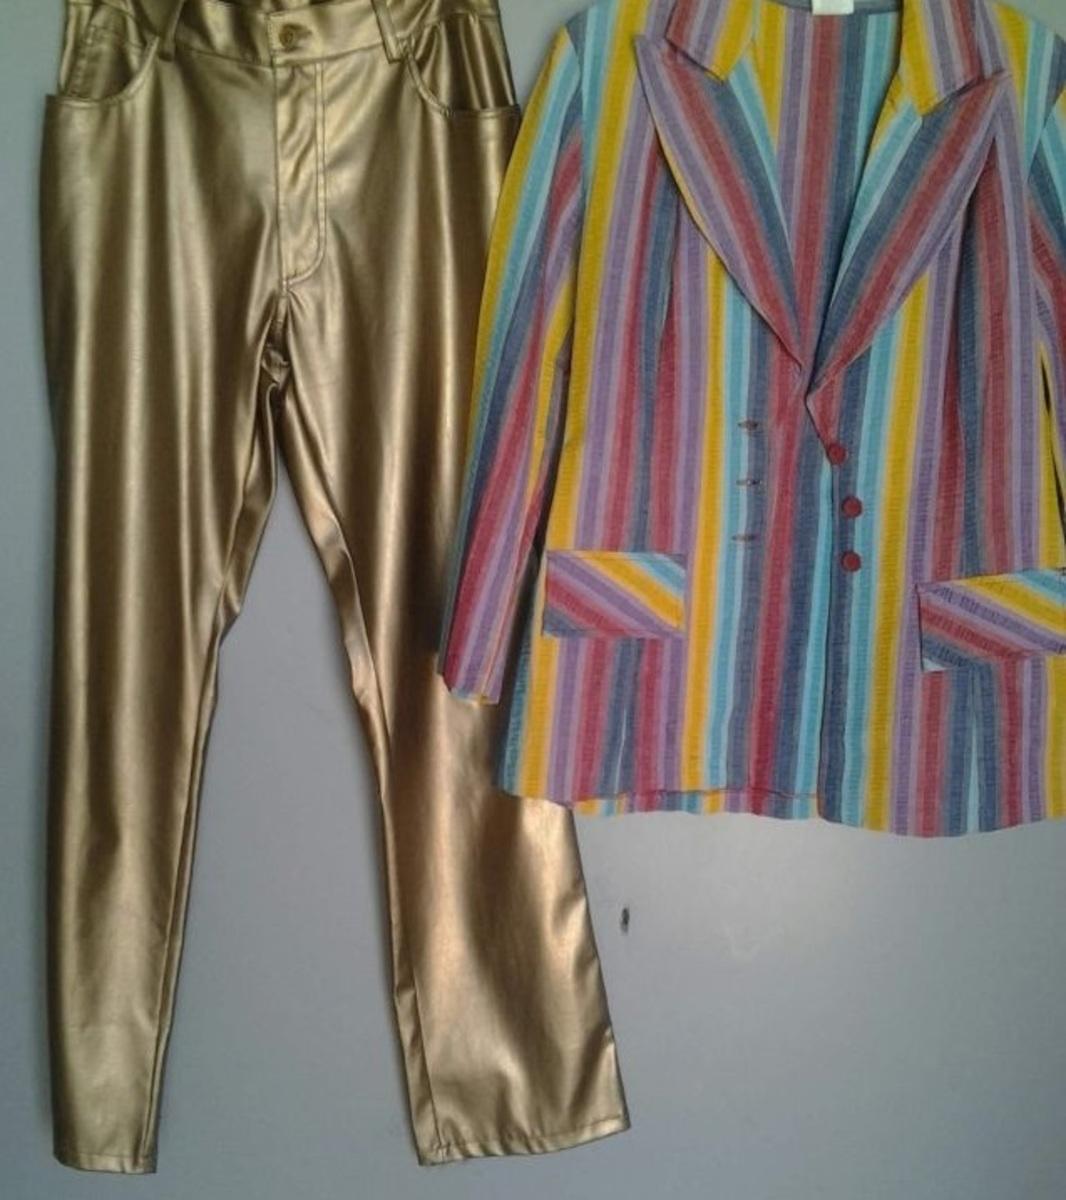 David Bowie worn Golden Pants and Color Jacket